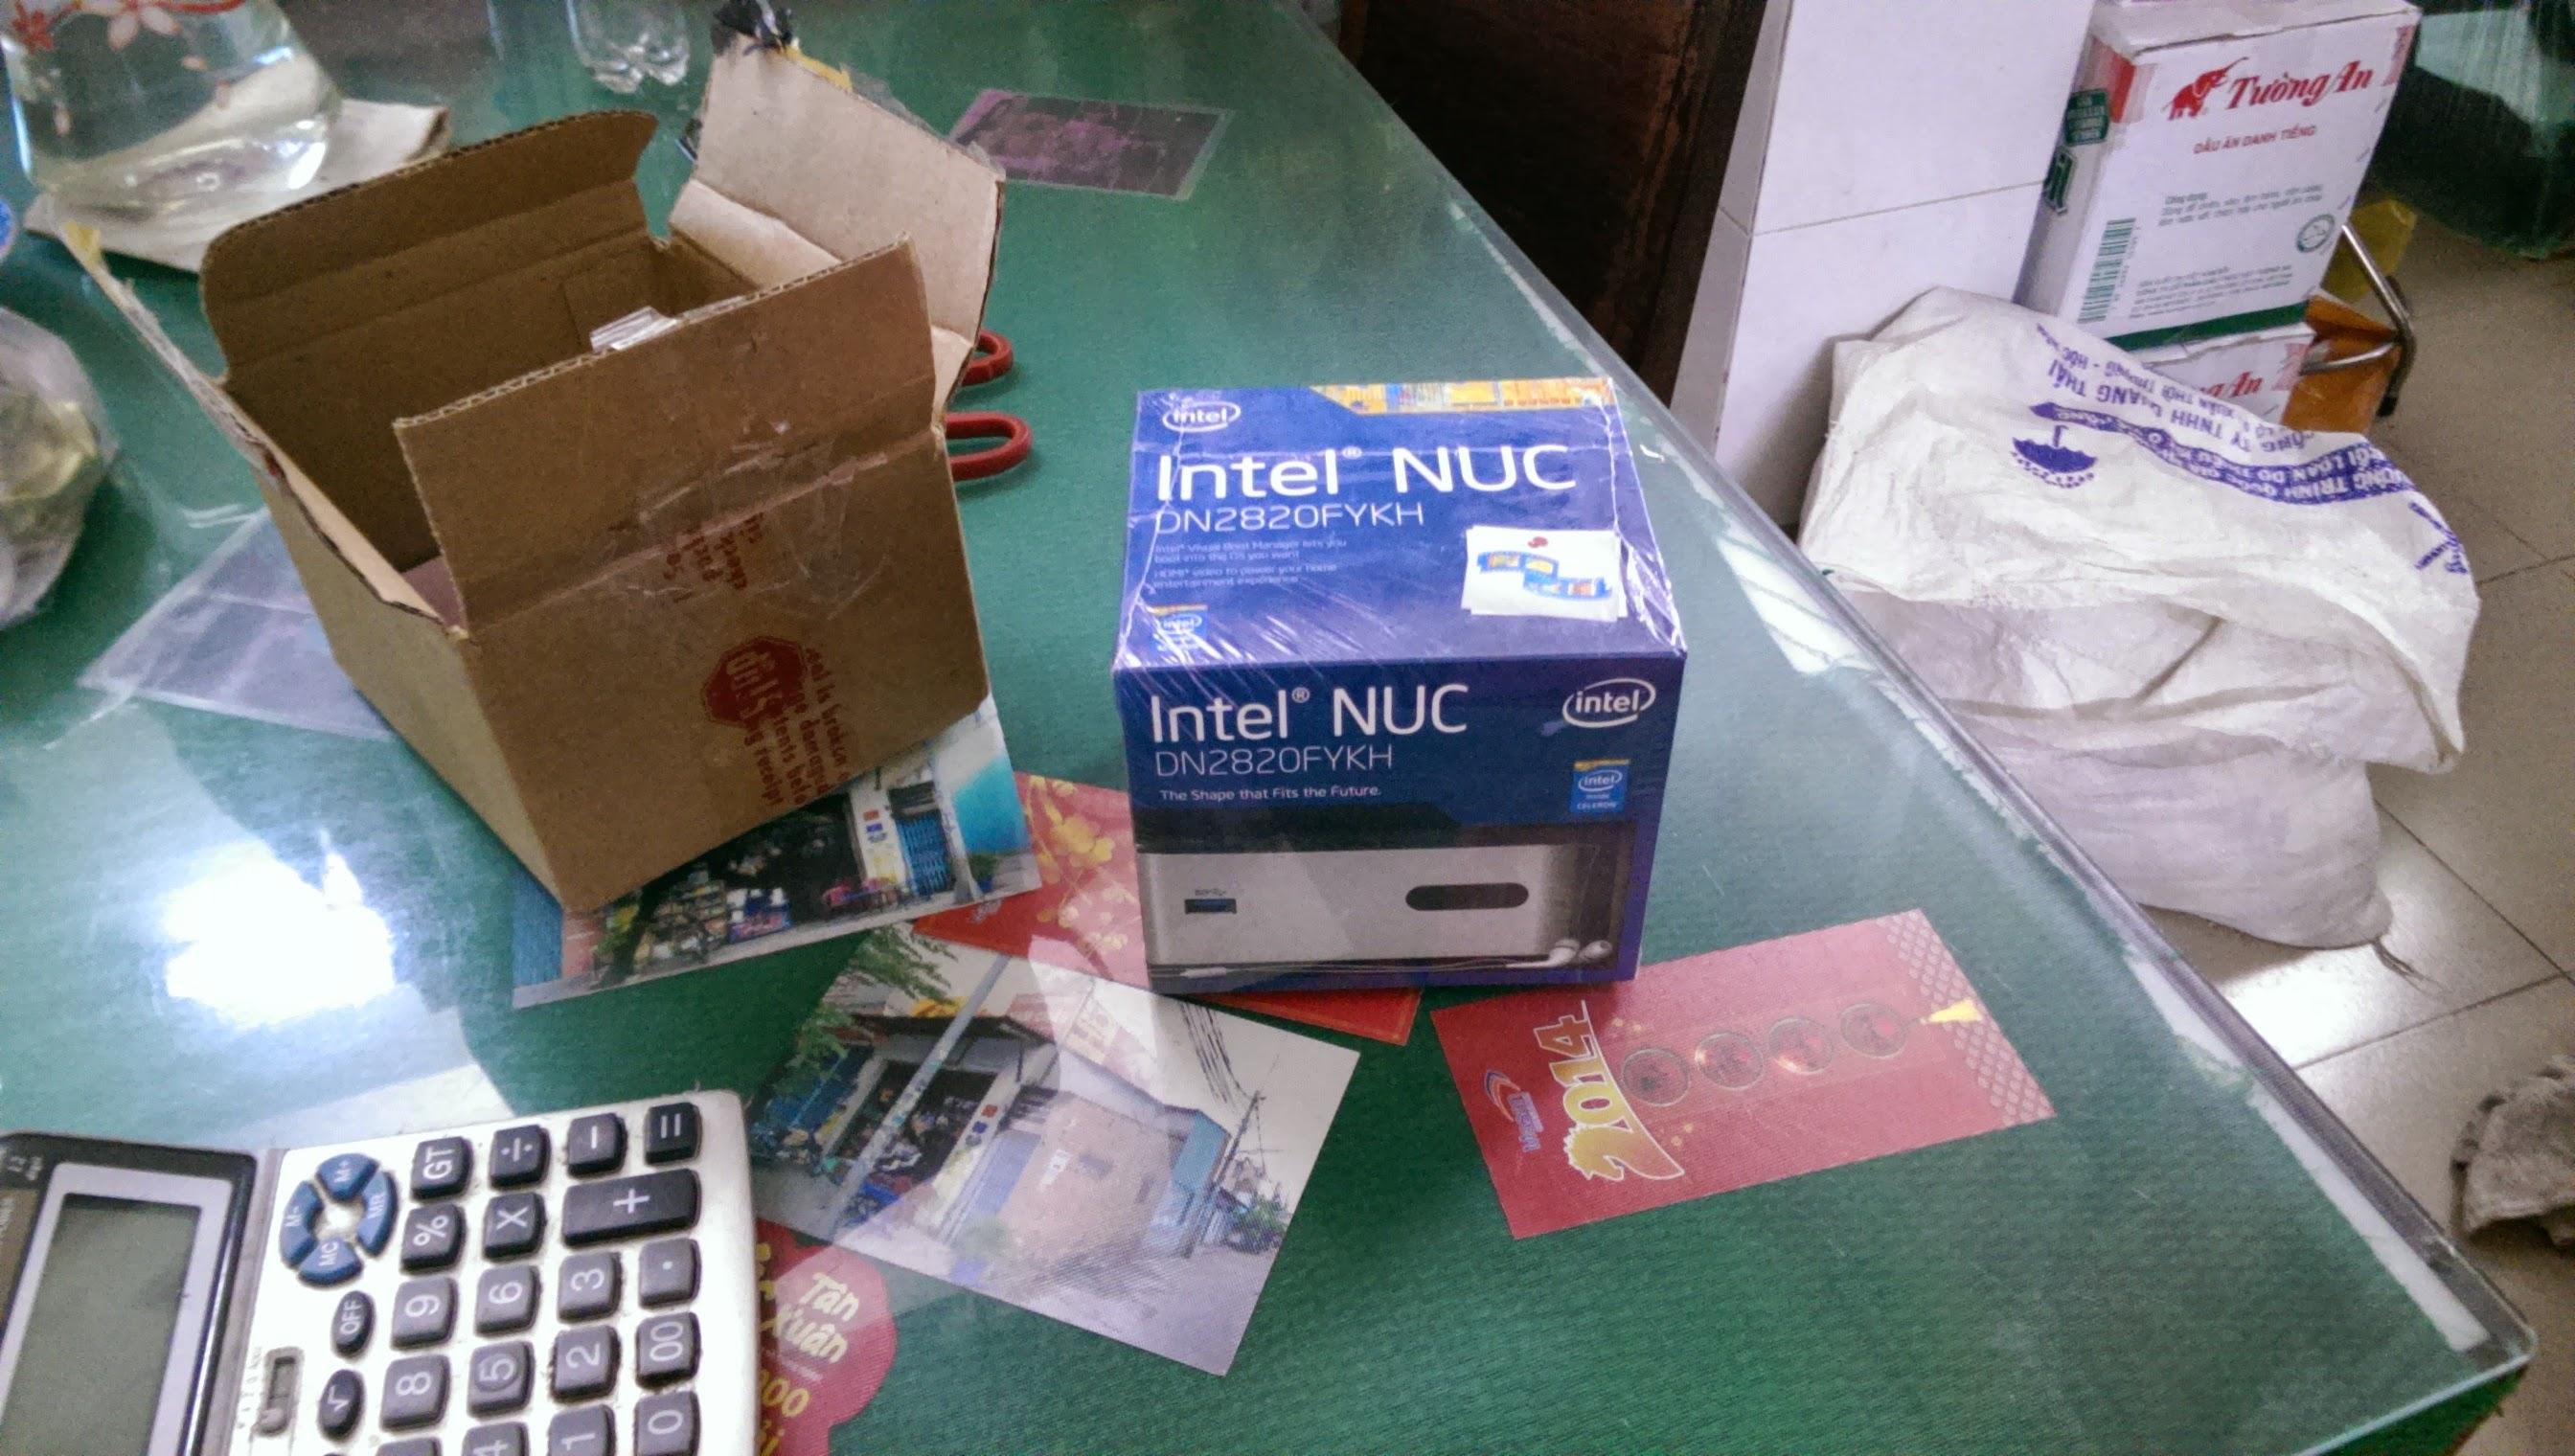 Intel Nuc Forums